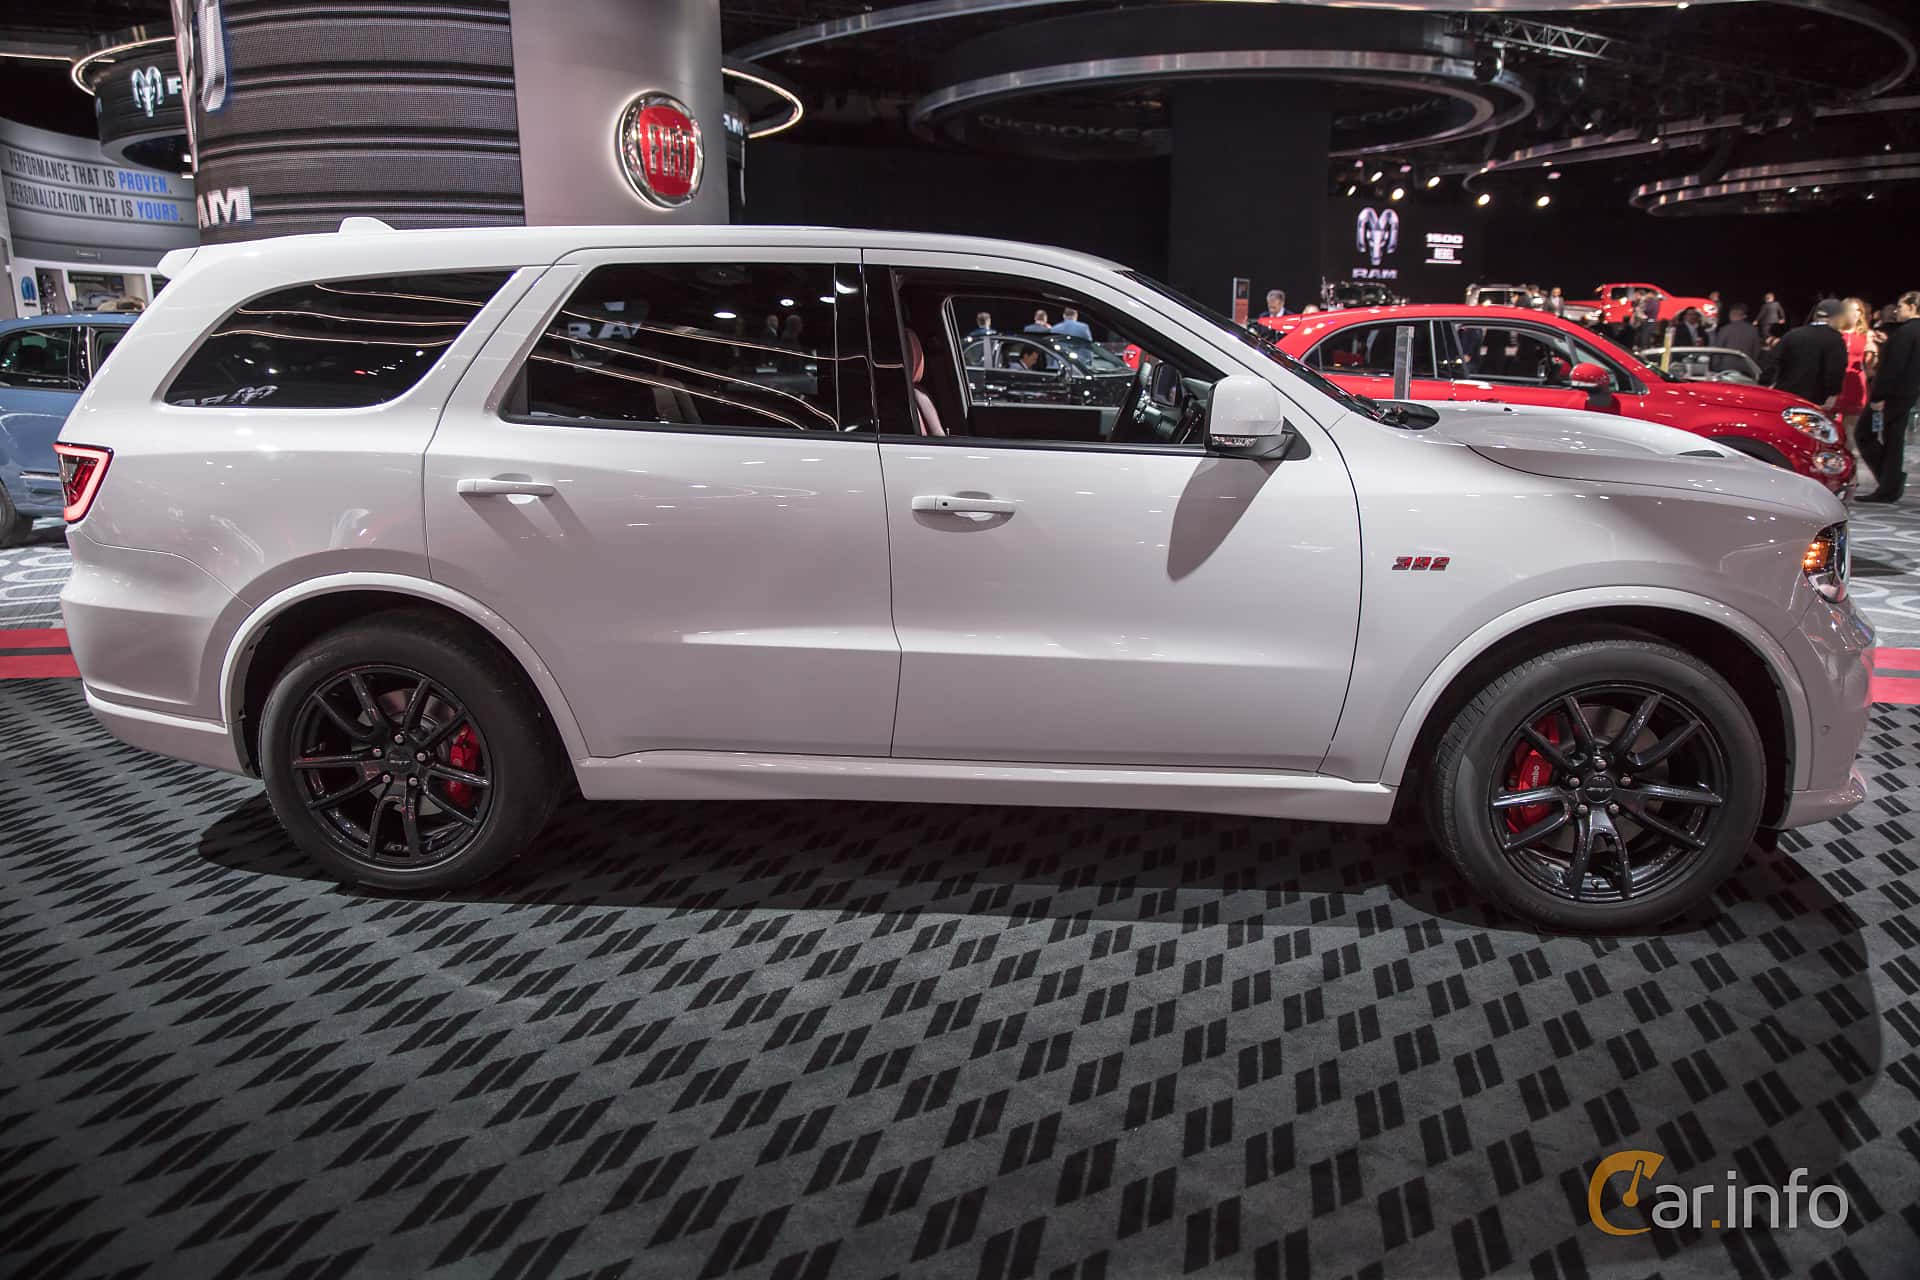 Taken At North American International Auto Show - Durango car show